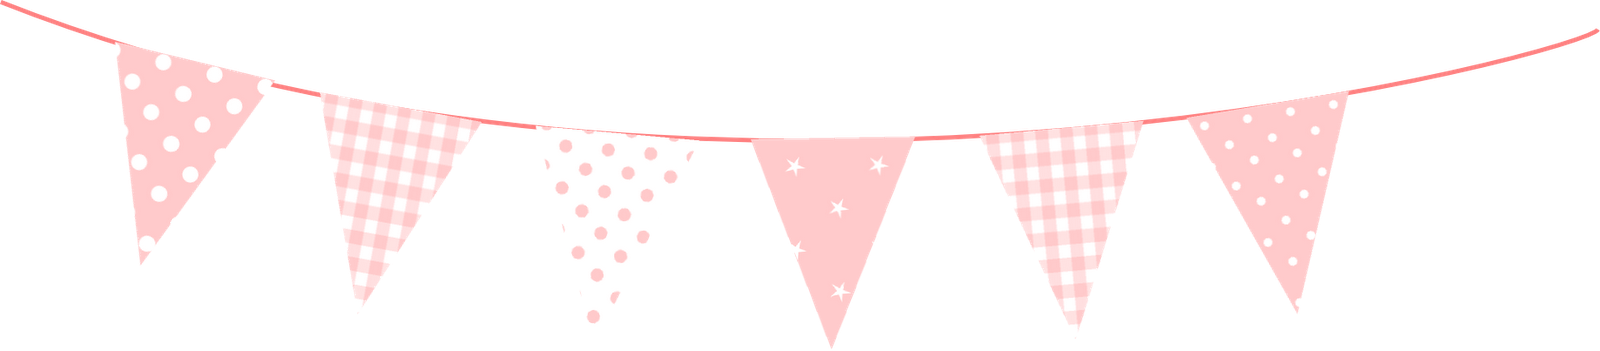 Free Printable Mini Bunting Polka Dot Bunting Party